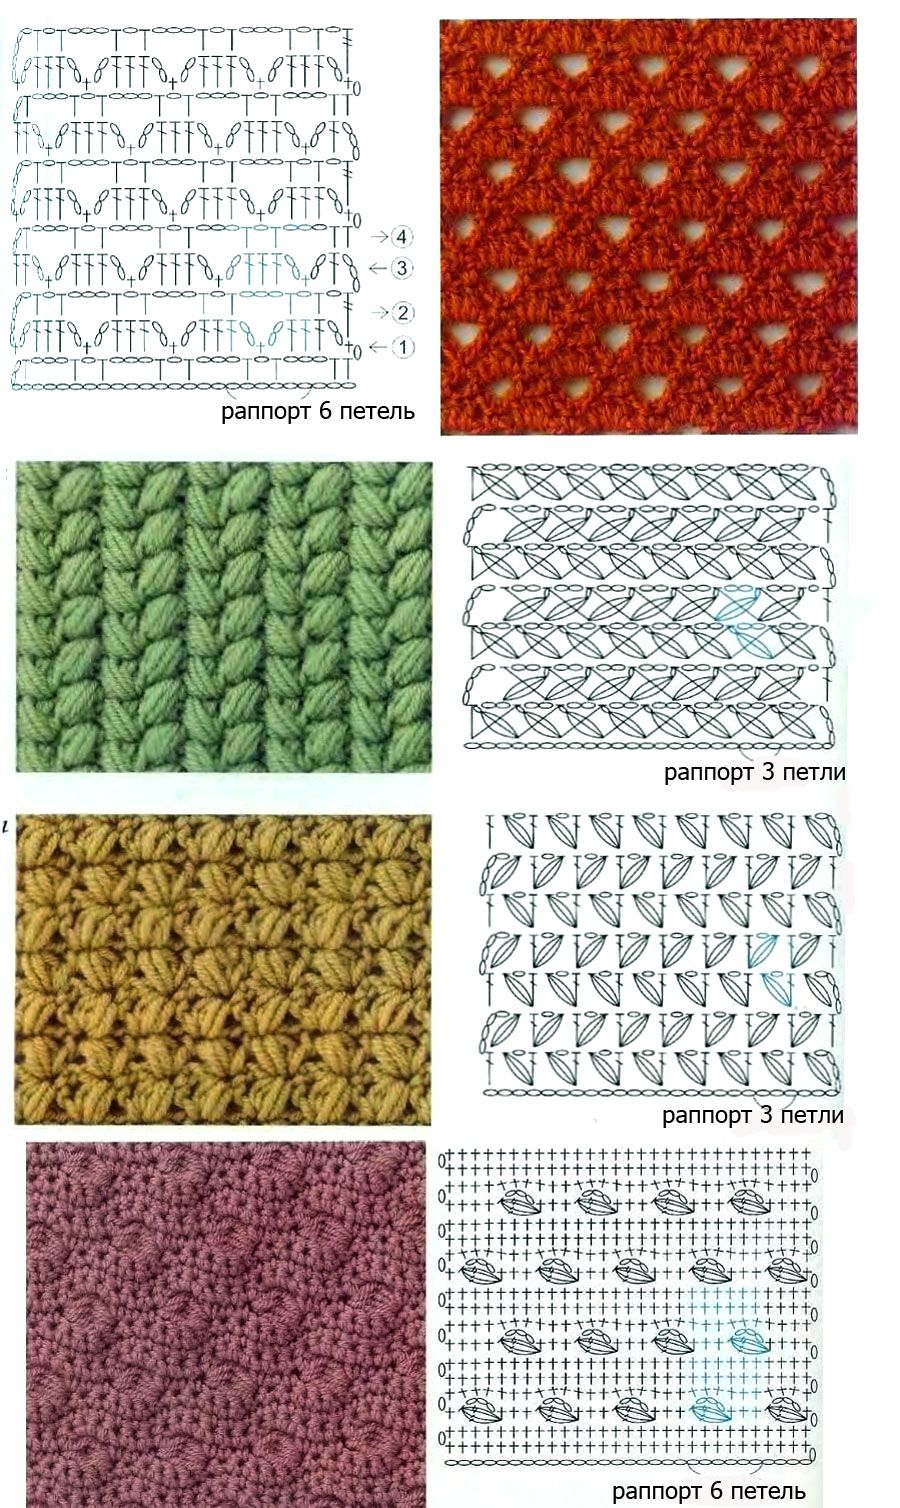 Pin by eleni kontodima on πλεκτο in 2018 | Pinterest | Crochet ...